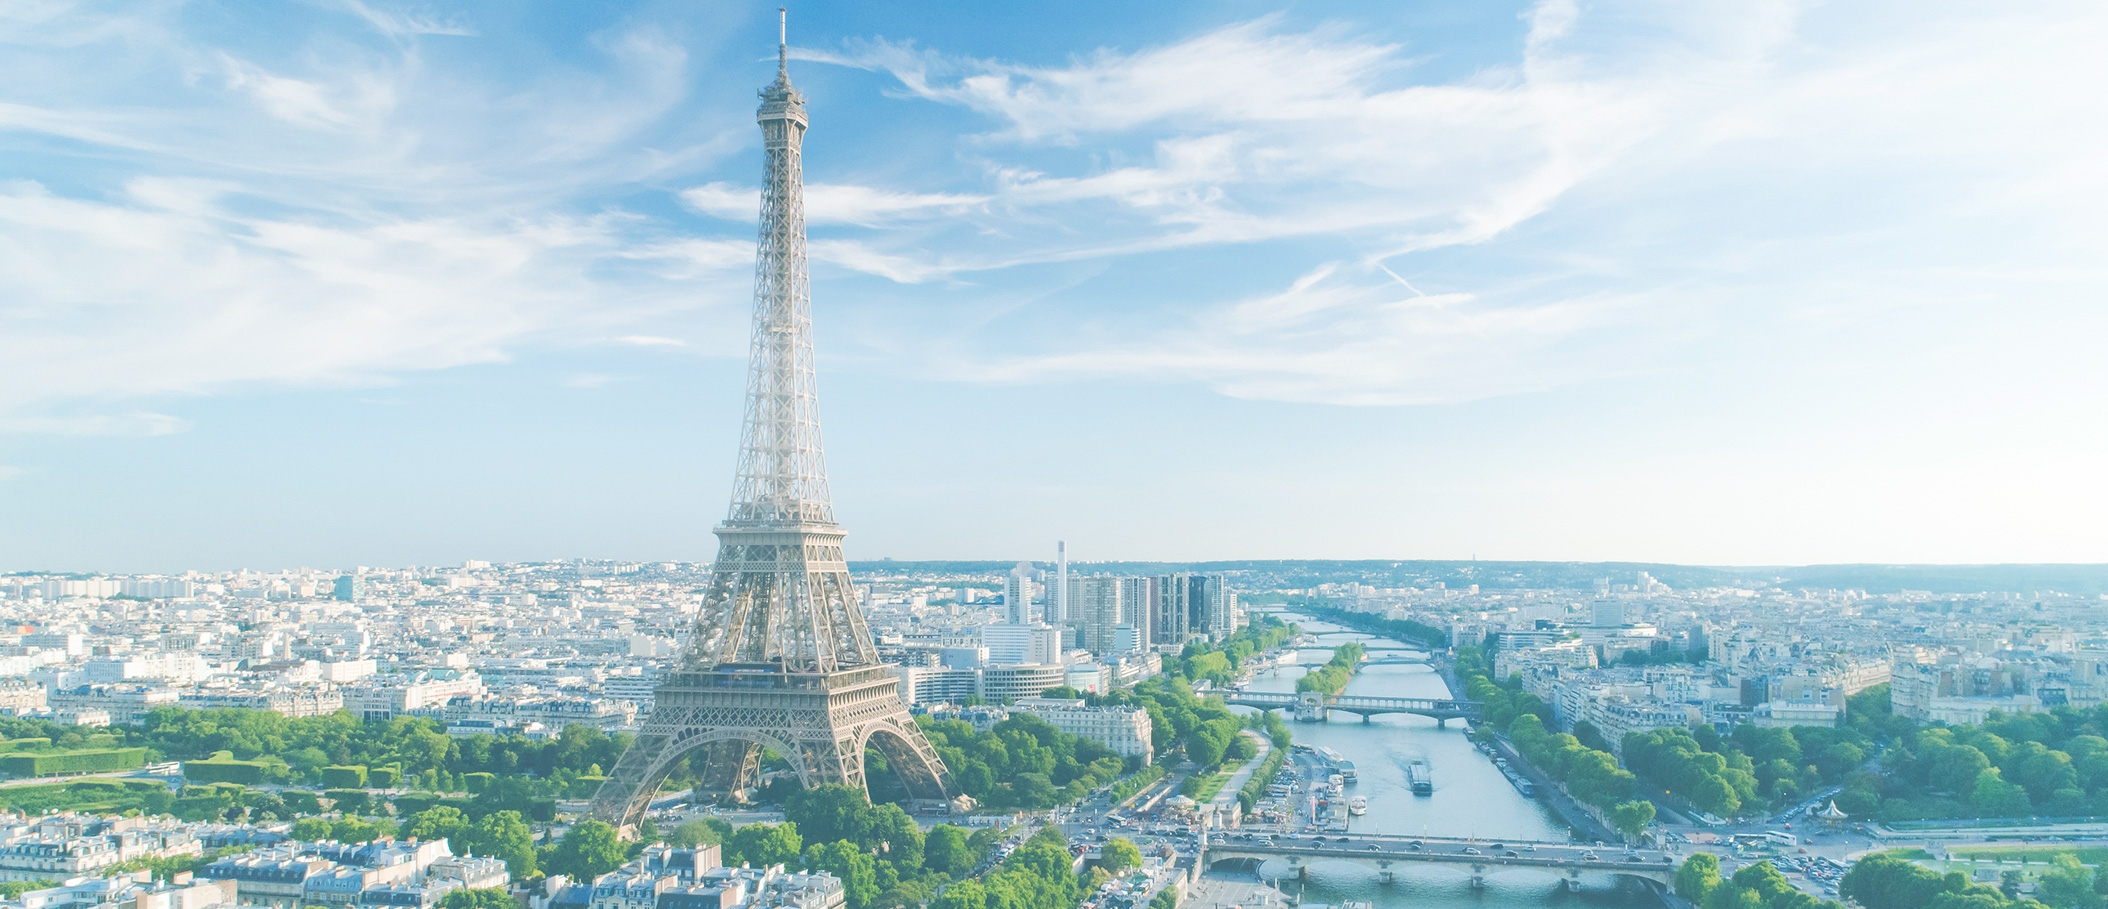 Busreisen Paris - Städtereisen - Tourgold Städte Reisen